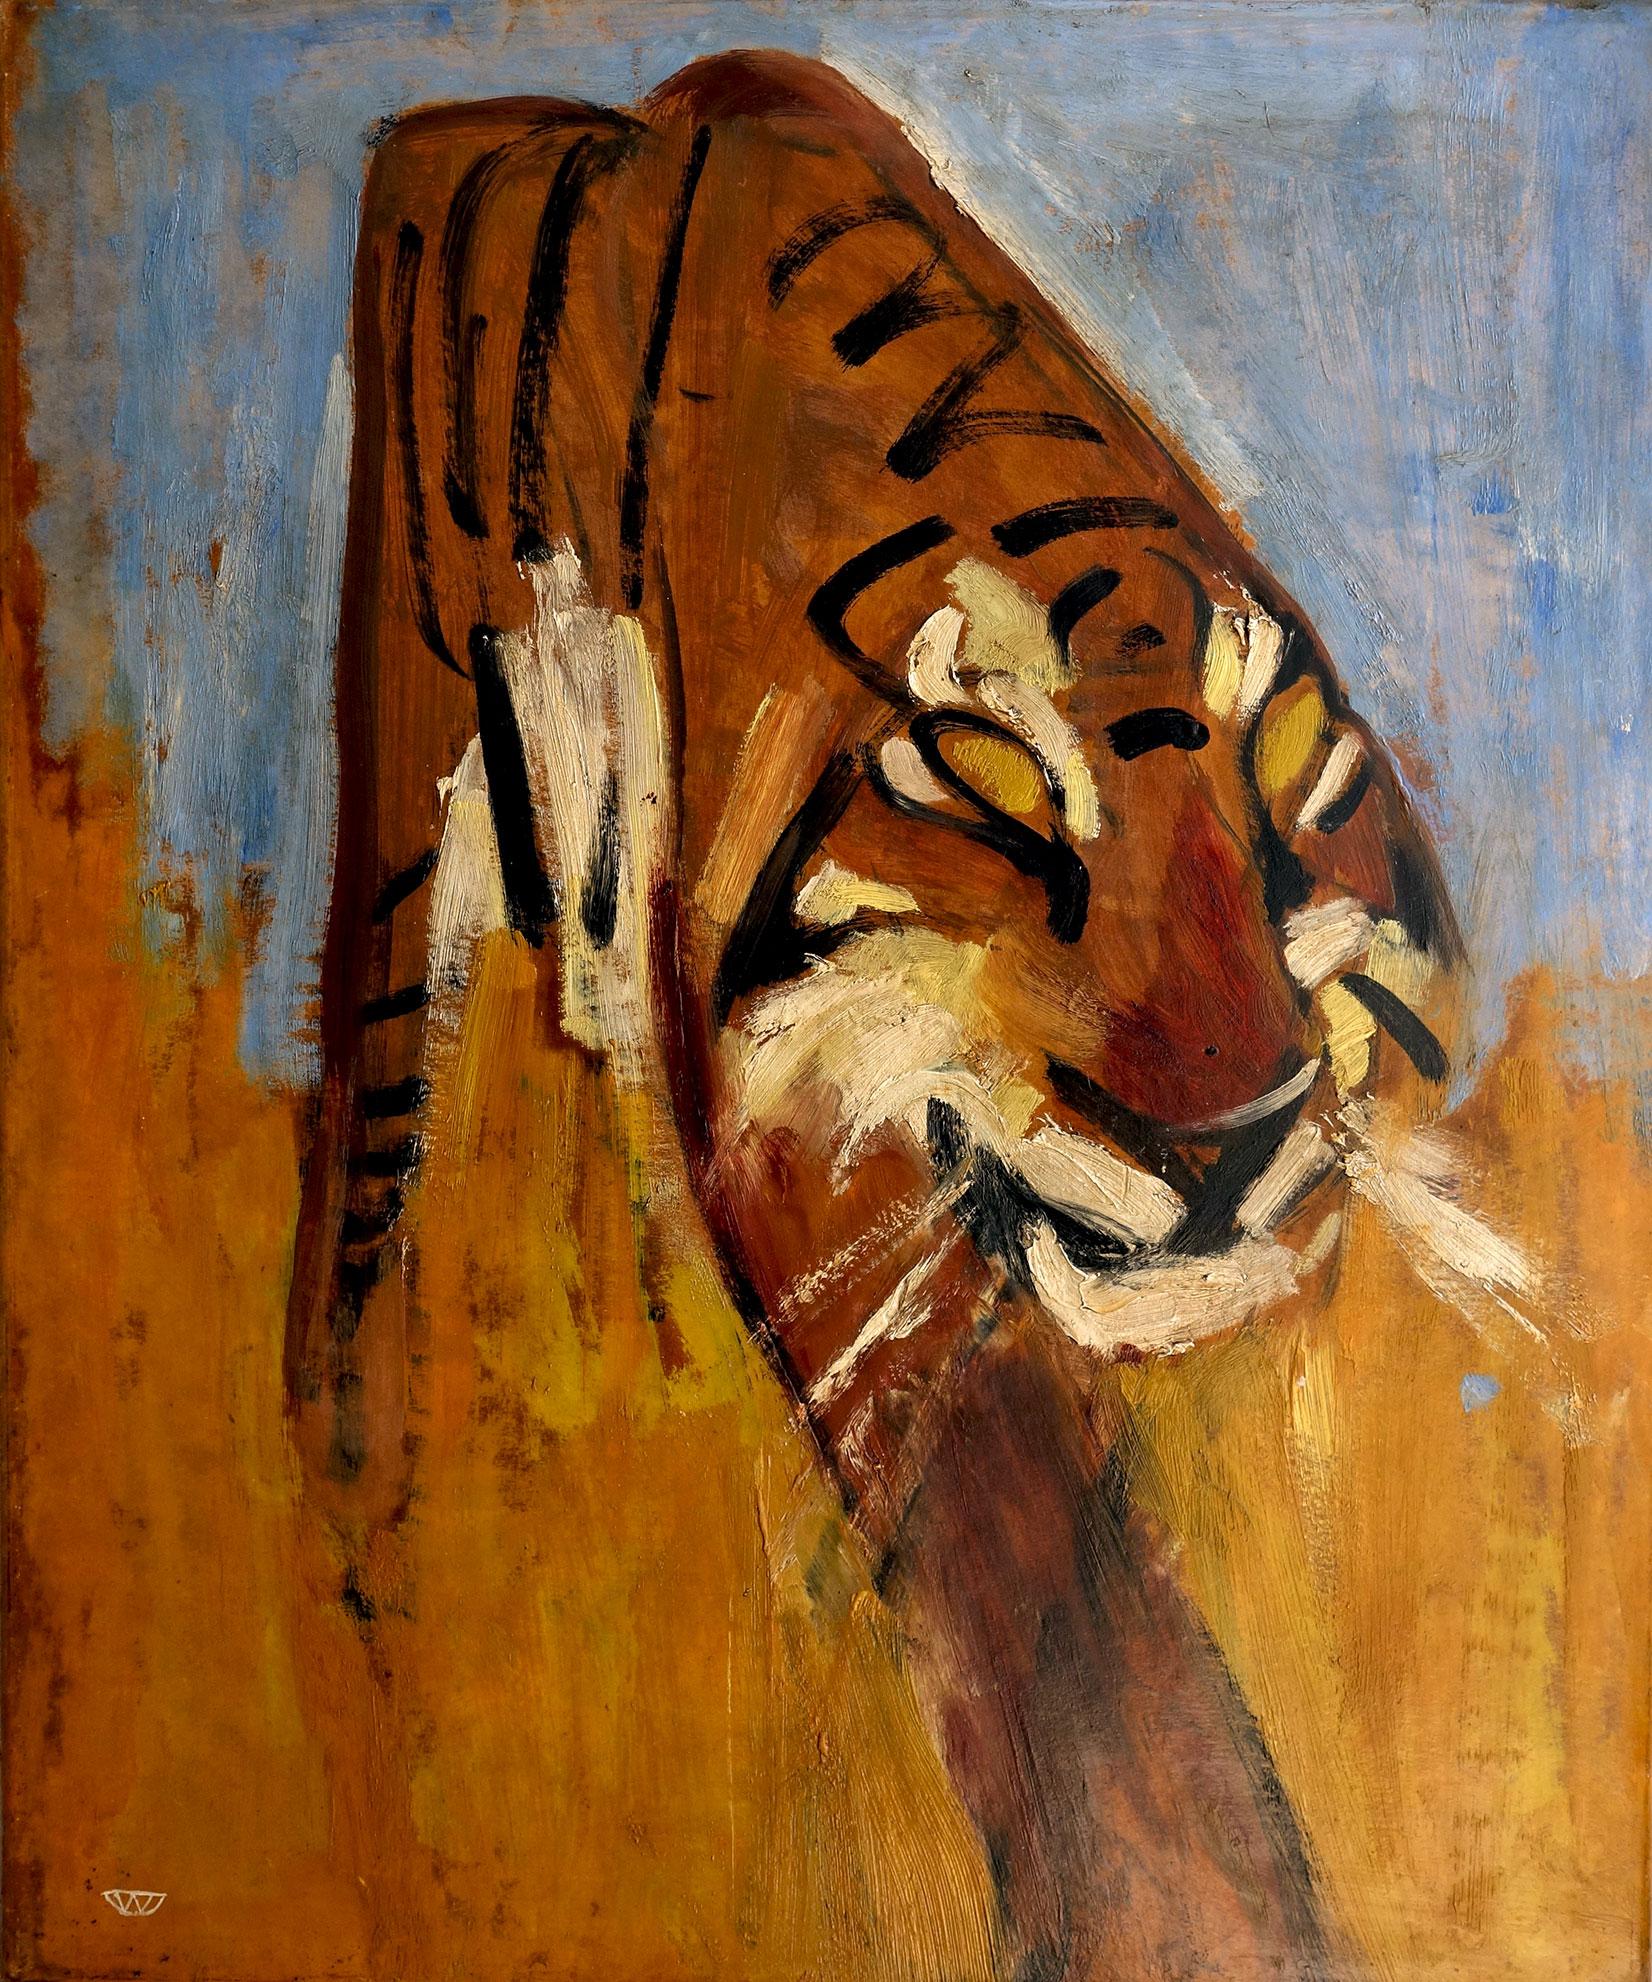 Sluipende tijger- Kees Timmer